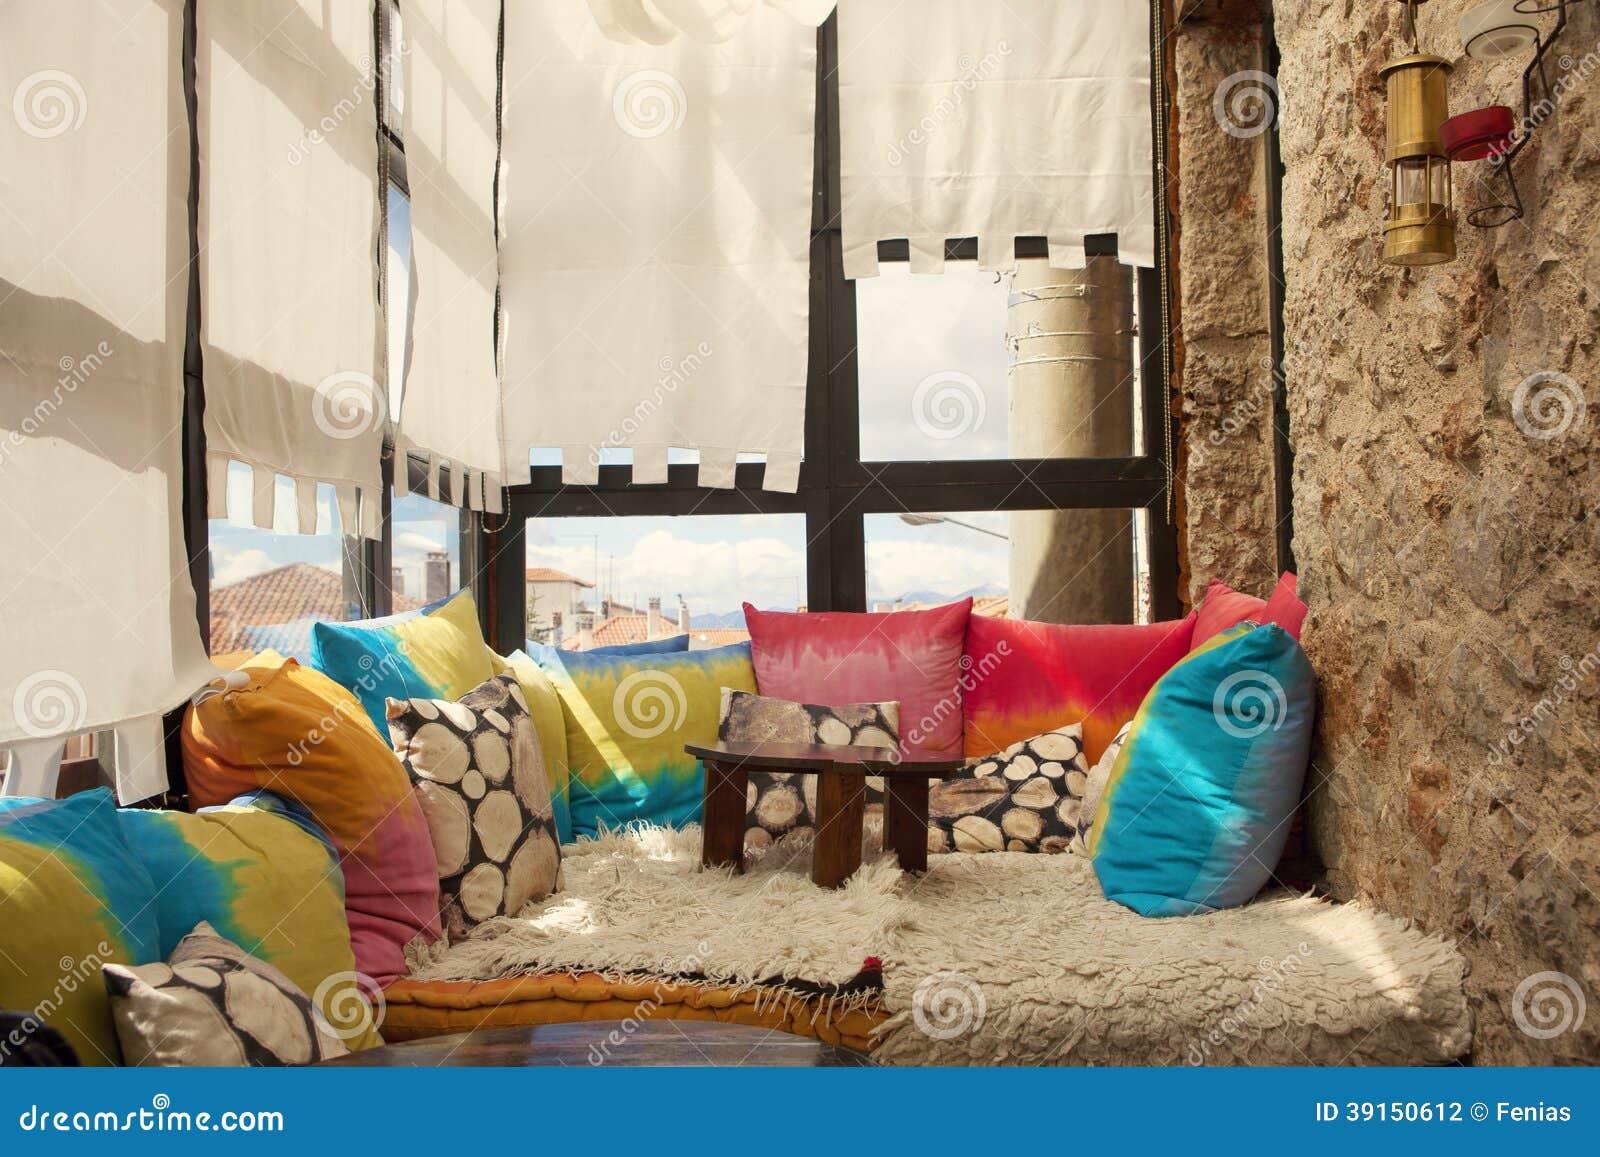 Terrace With Seats Stock Photo Image Of Patio Balcomy 39150612